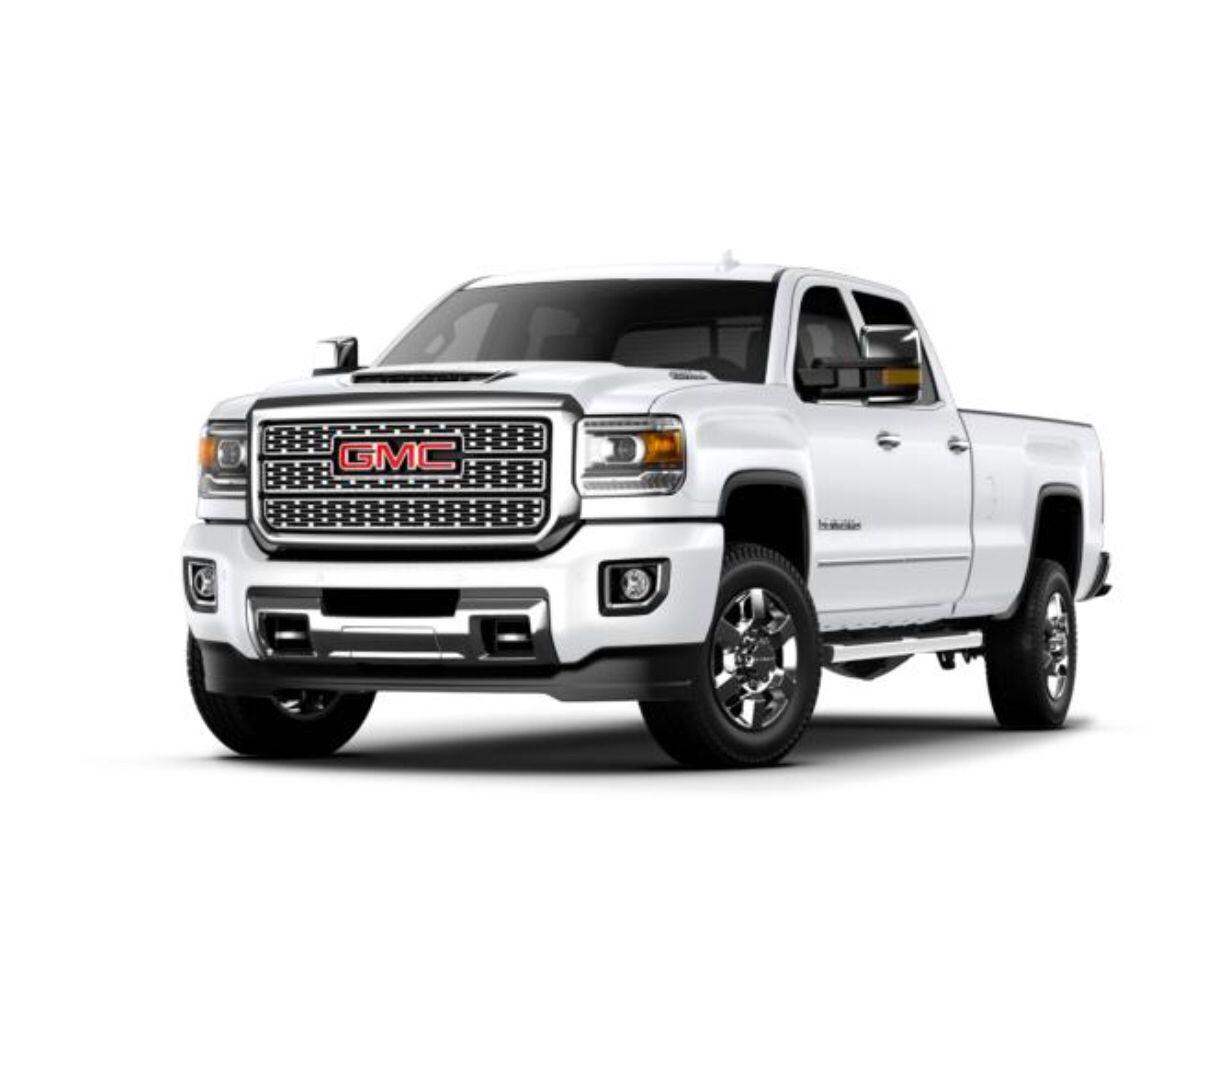 2018 Gmc Sierra Denali Hd 3500 6 6l Duramax Diesel Gmc Sierra